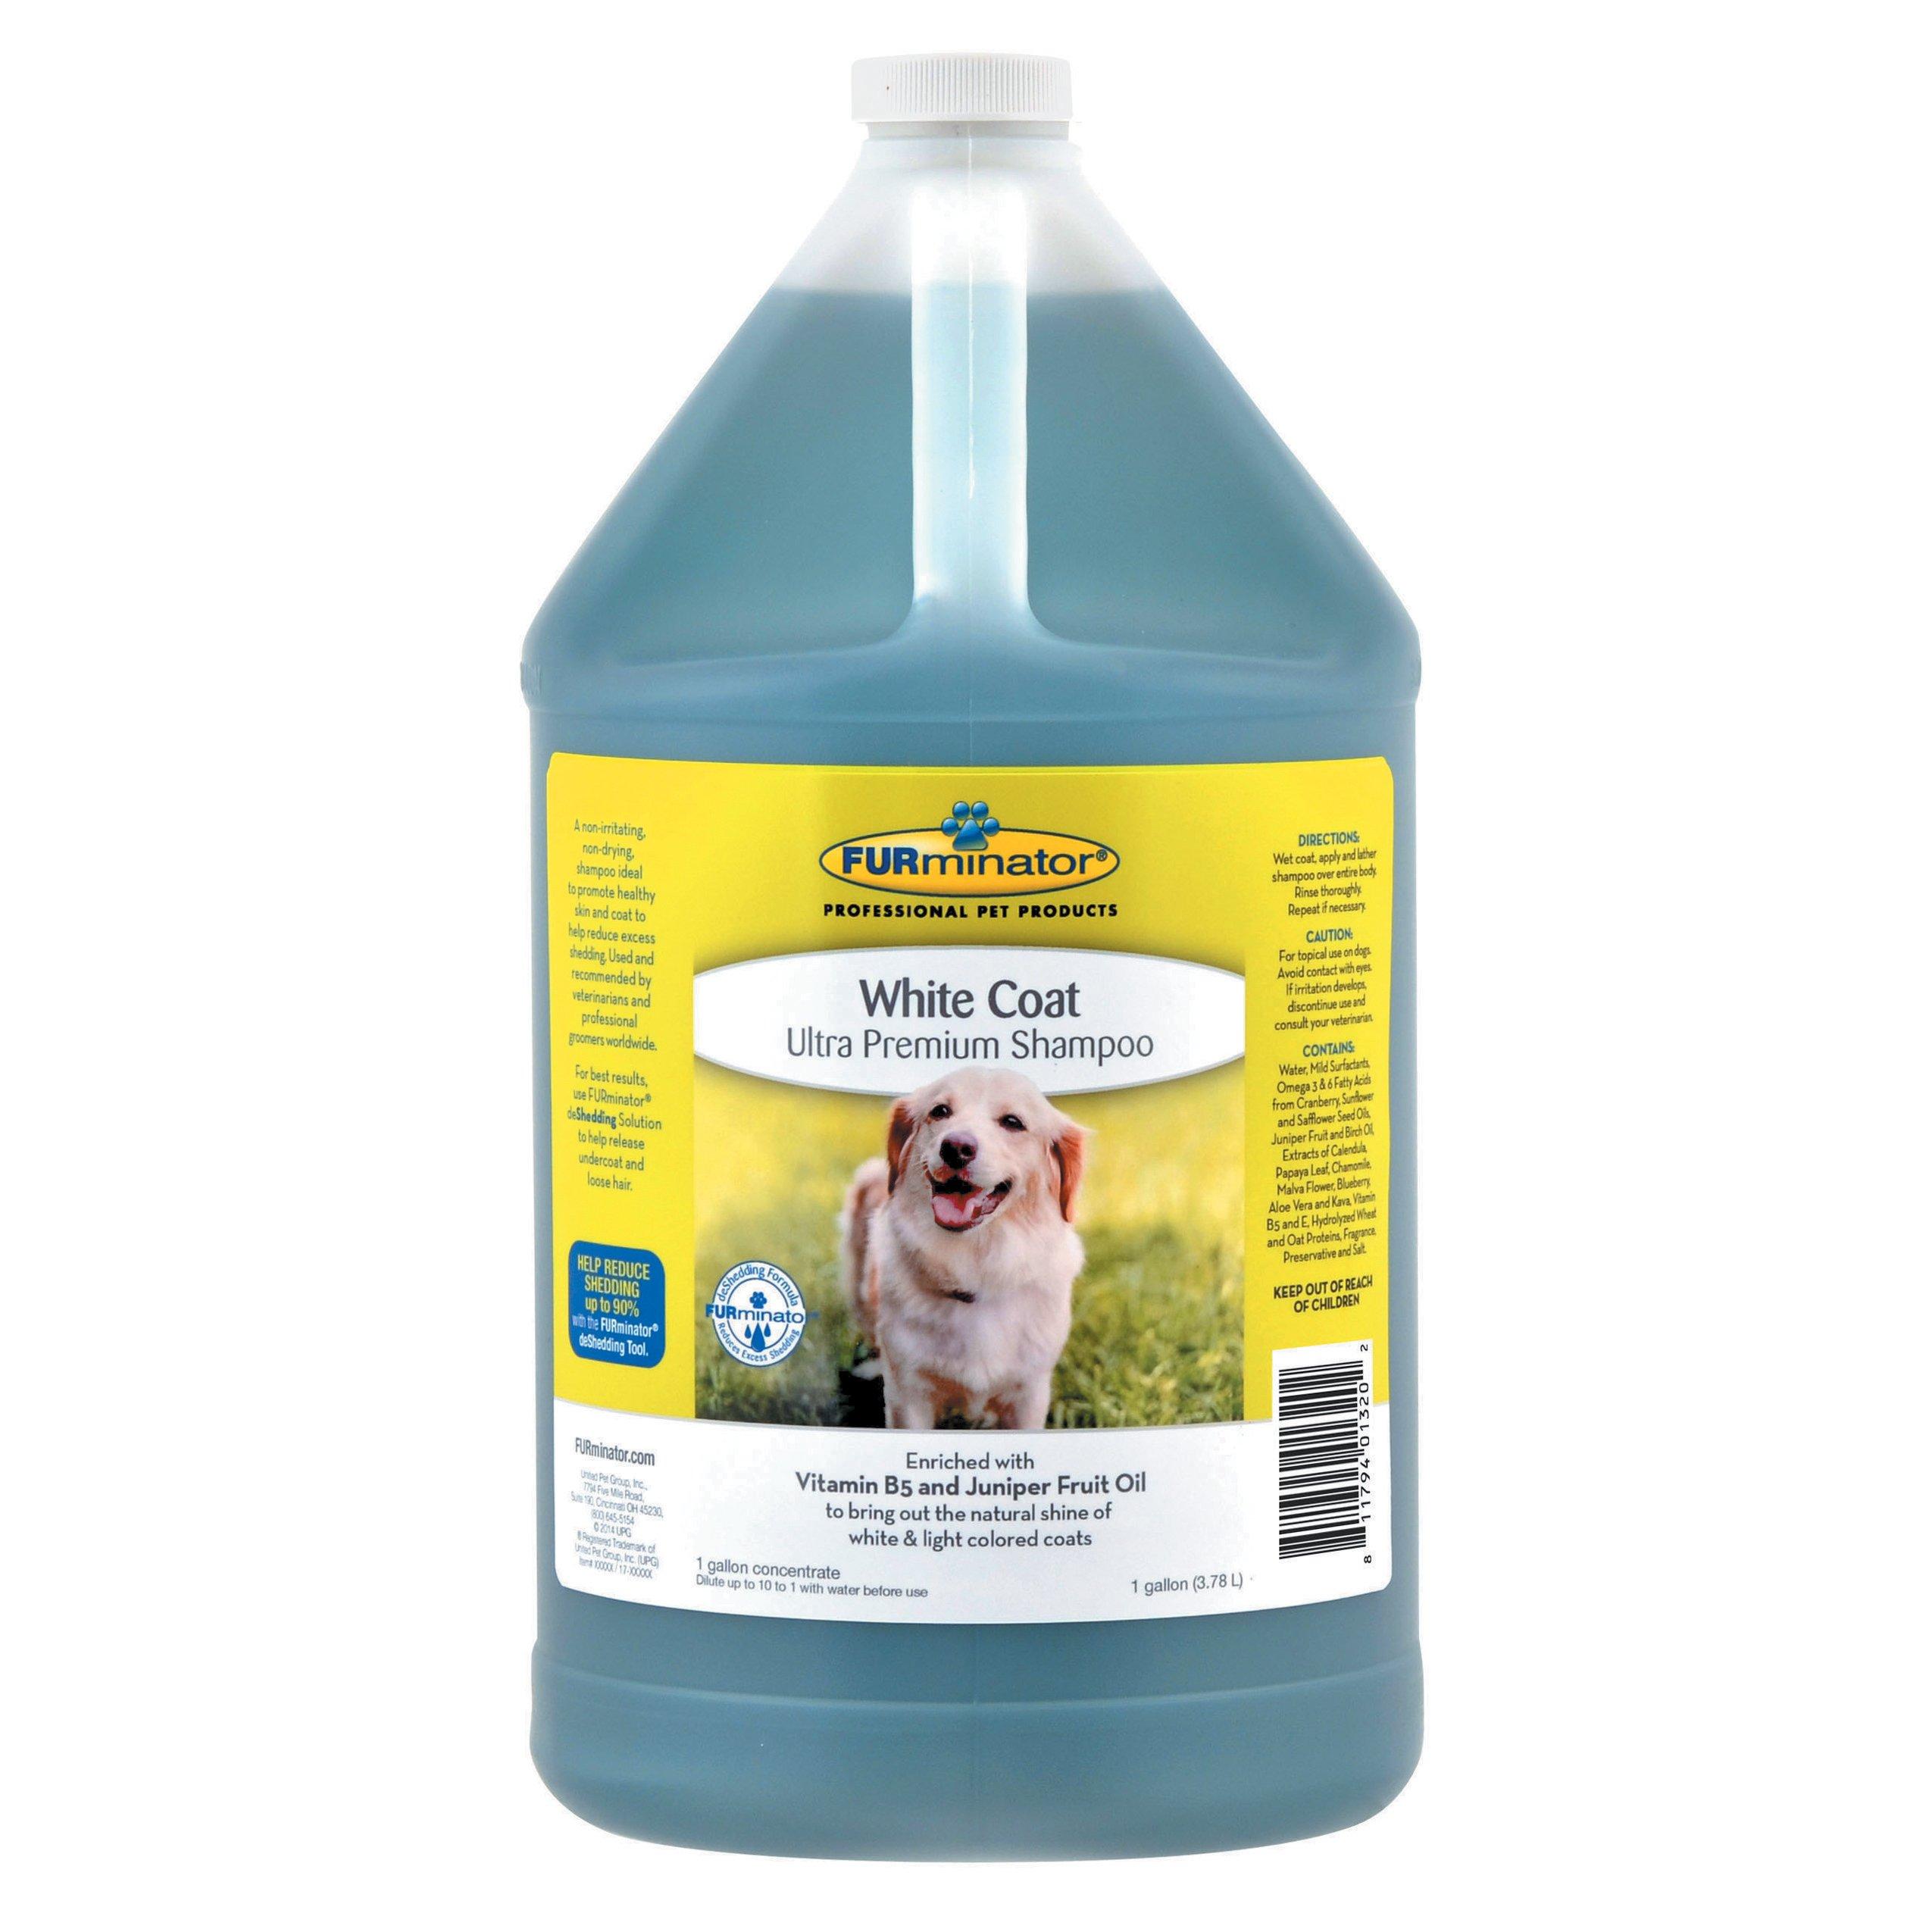 Furminator White Coat Ultra Premium Dog Shampoo, 1-Gallon by Furminator